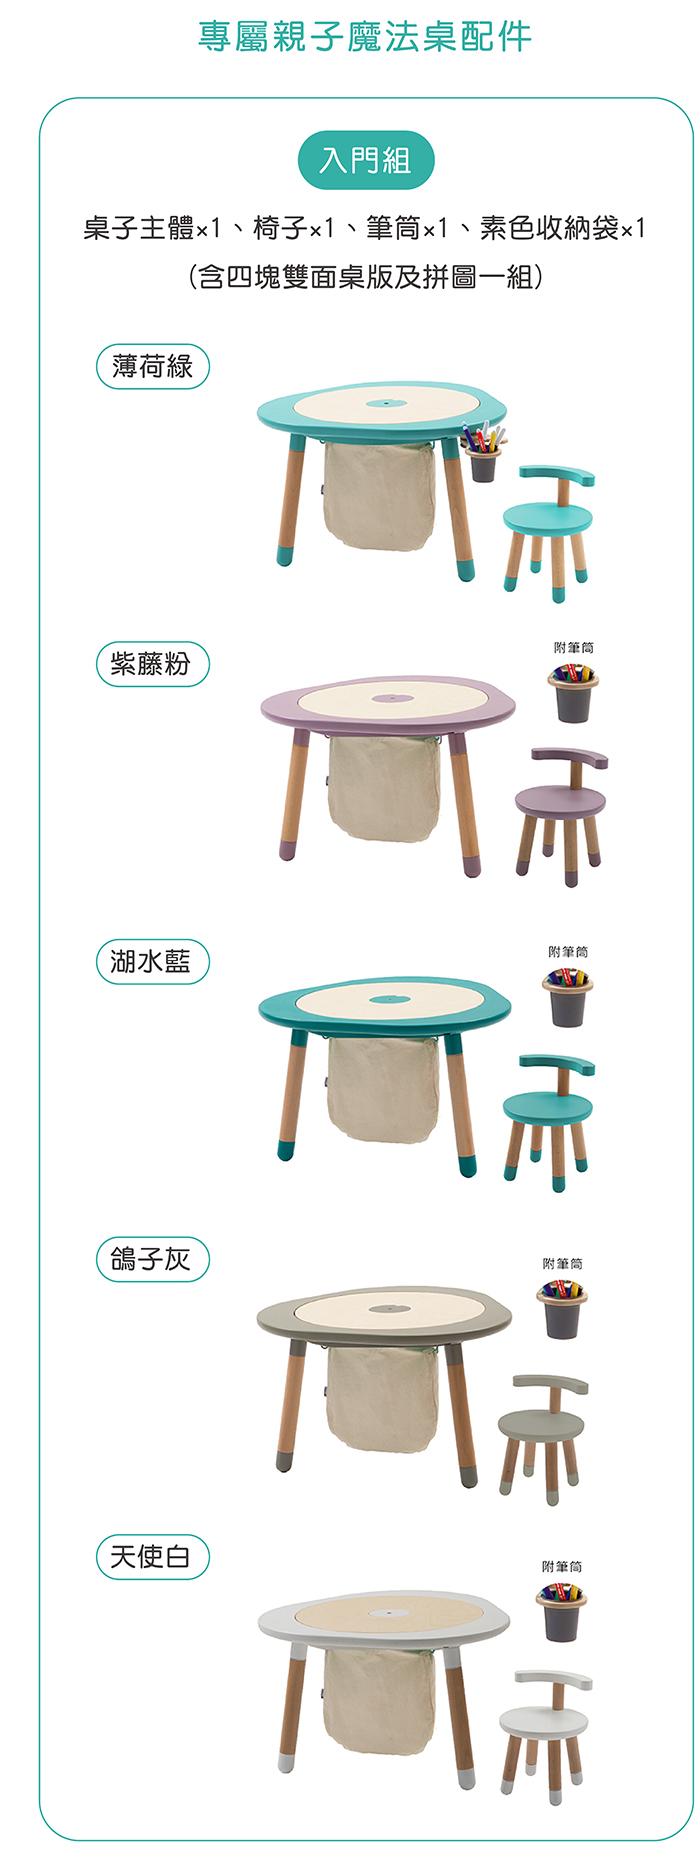 NOMI|MUTable 親子魔法成長桌(入門組)- 薄荷綠